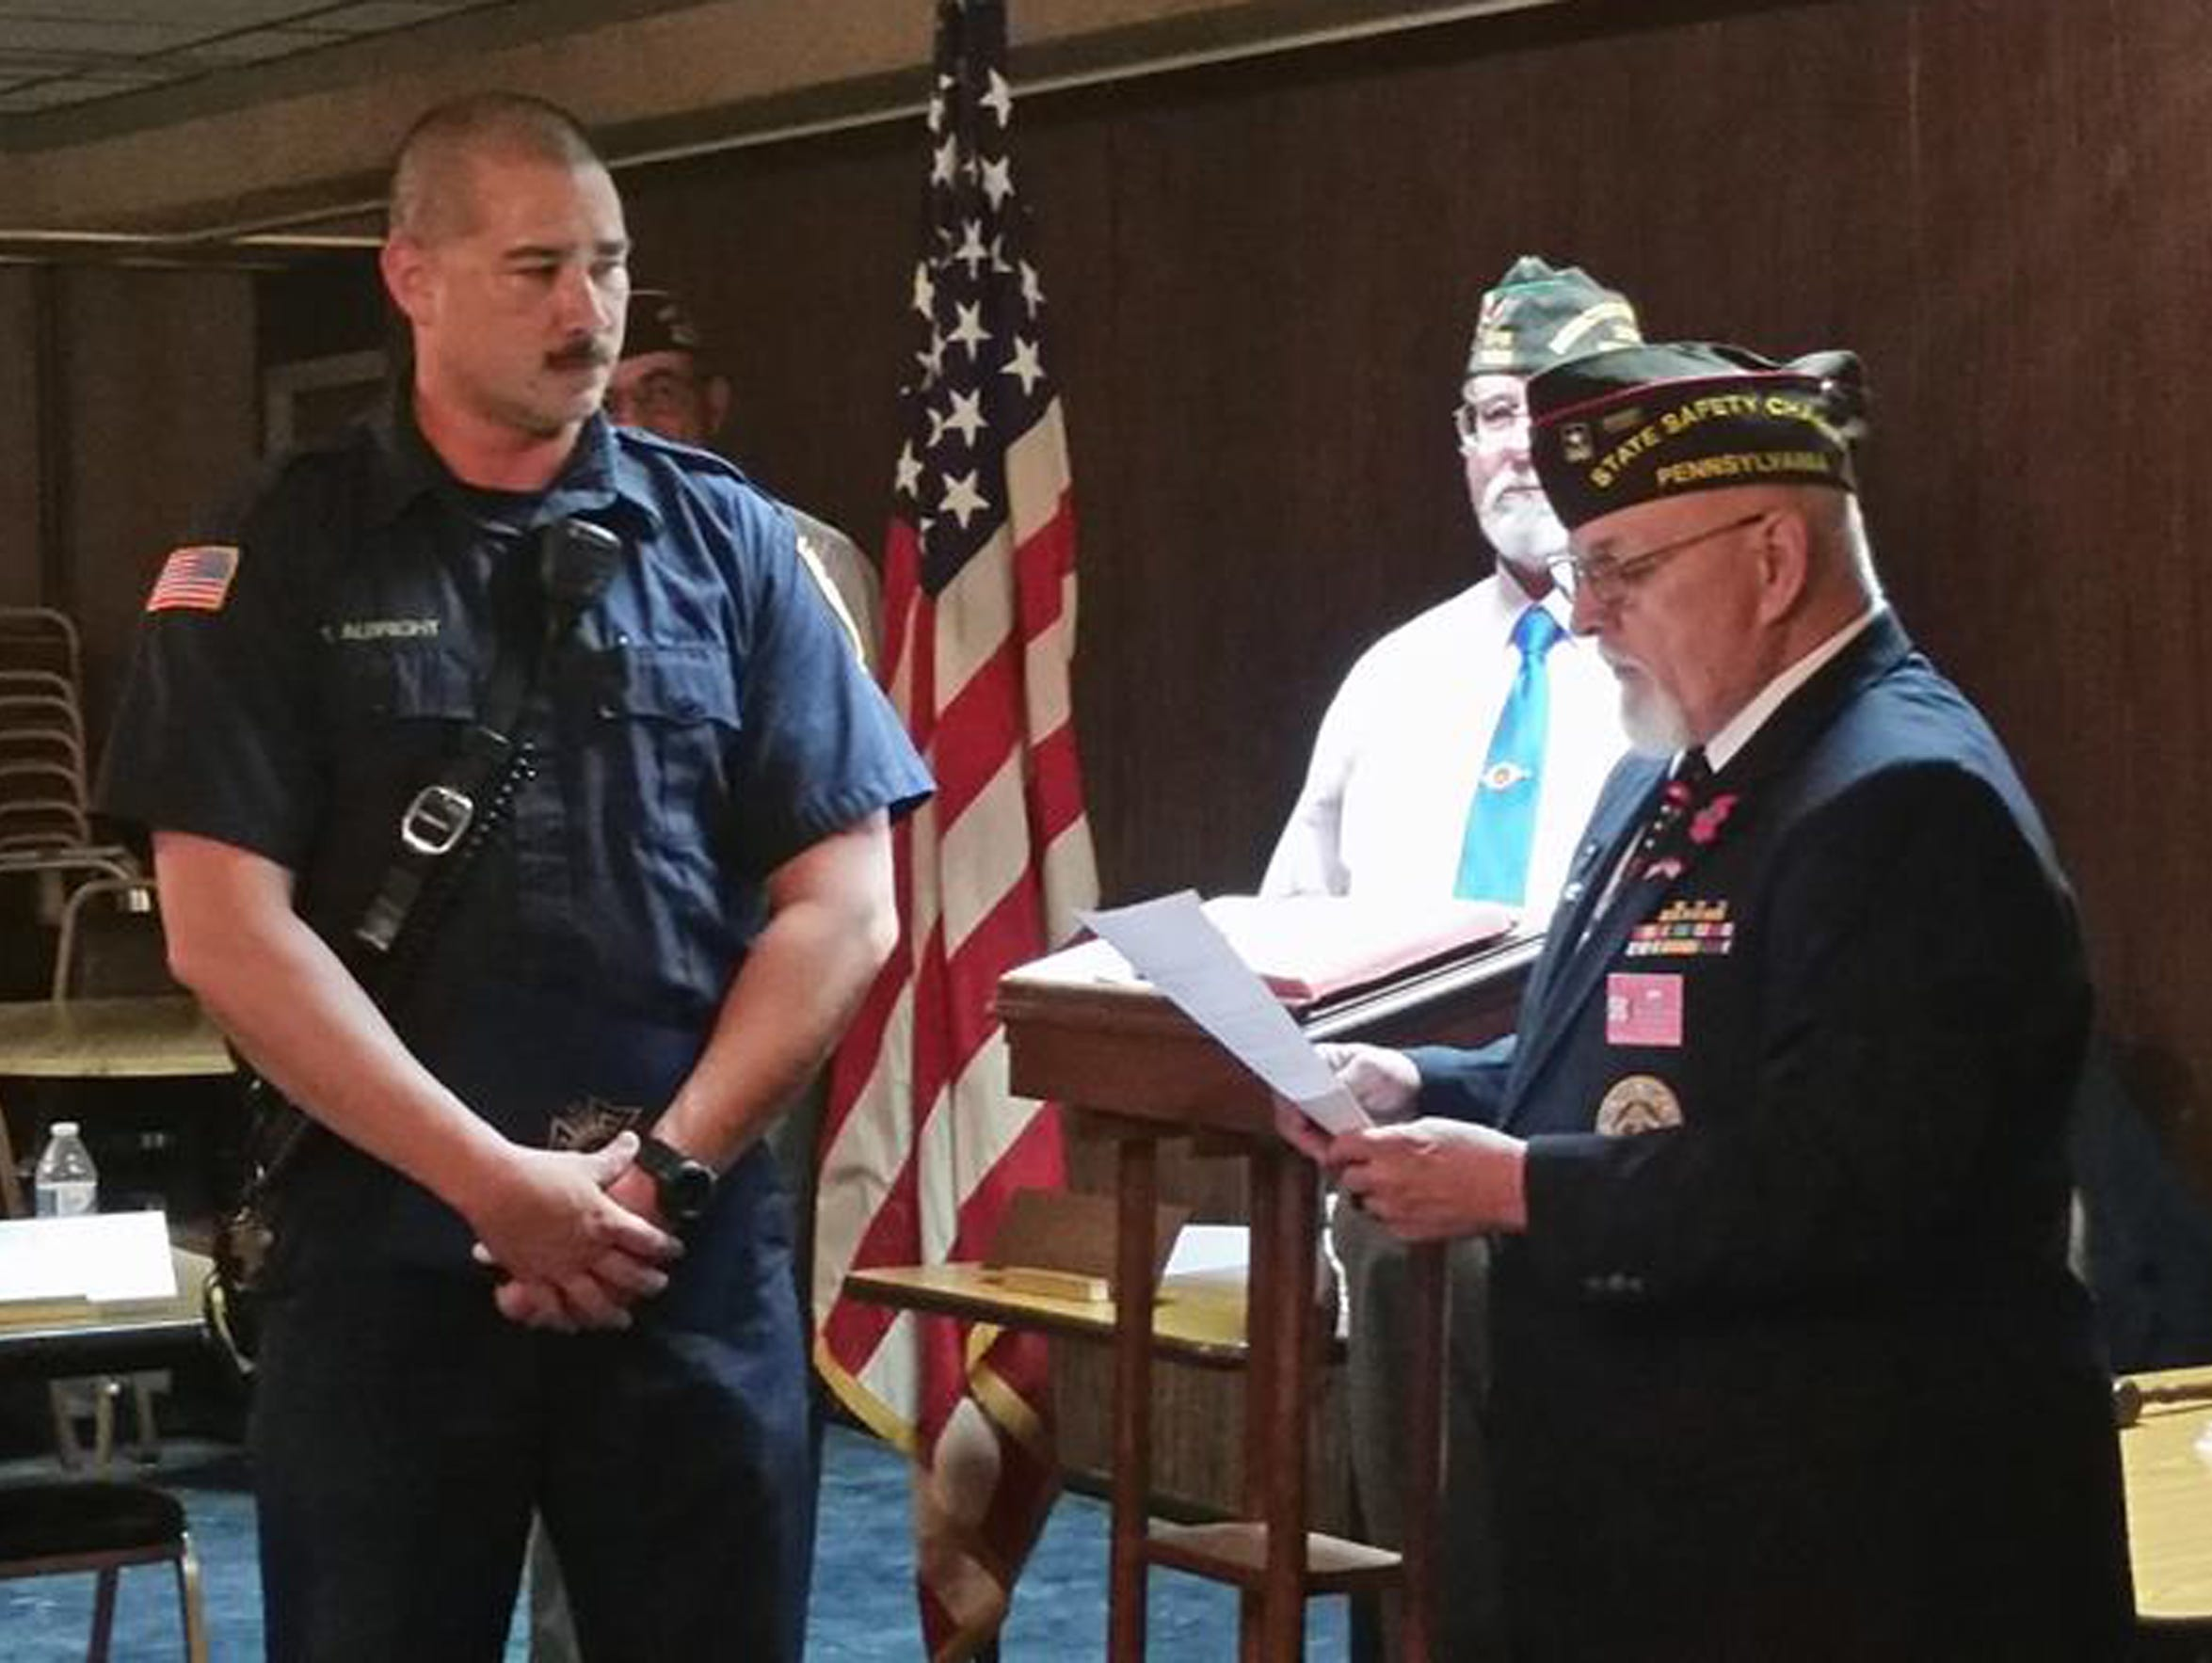 Chambersburg VFW Post 1599, Firefighter Tony E. Albright,